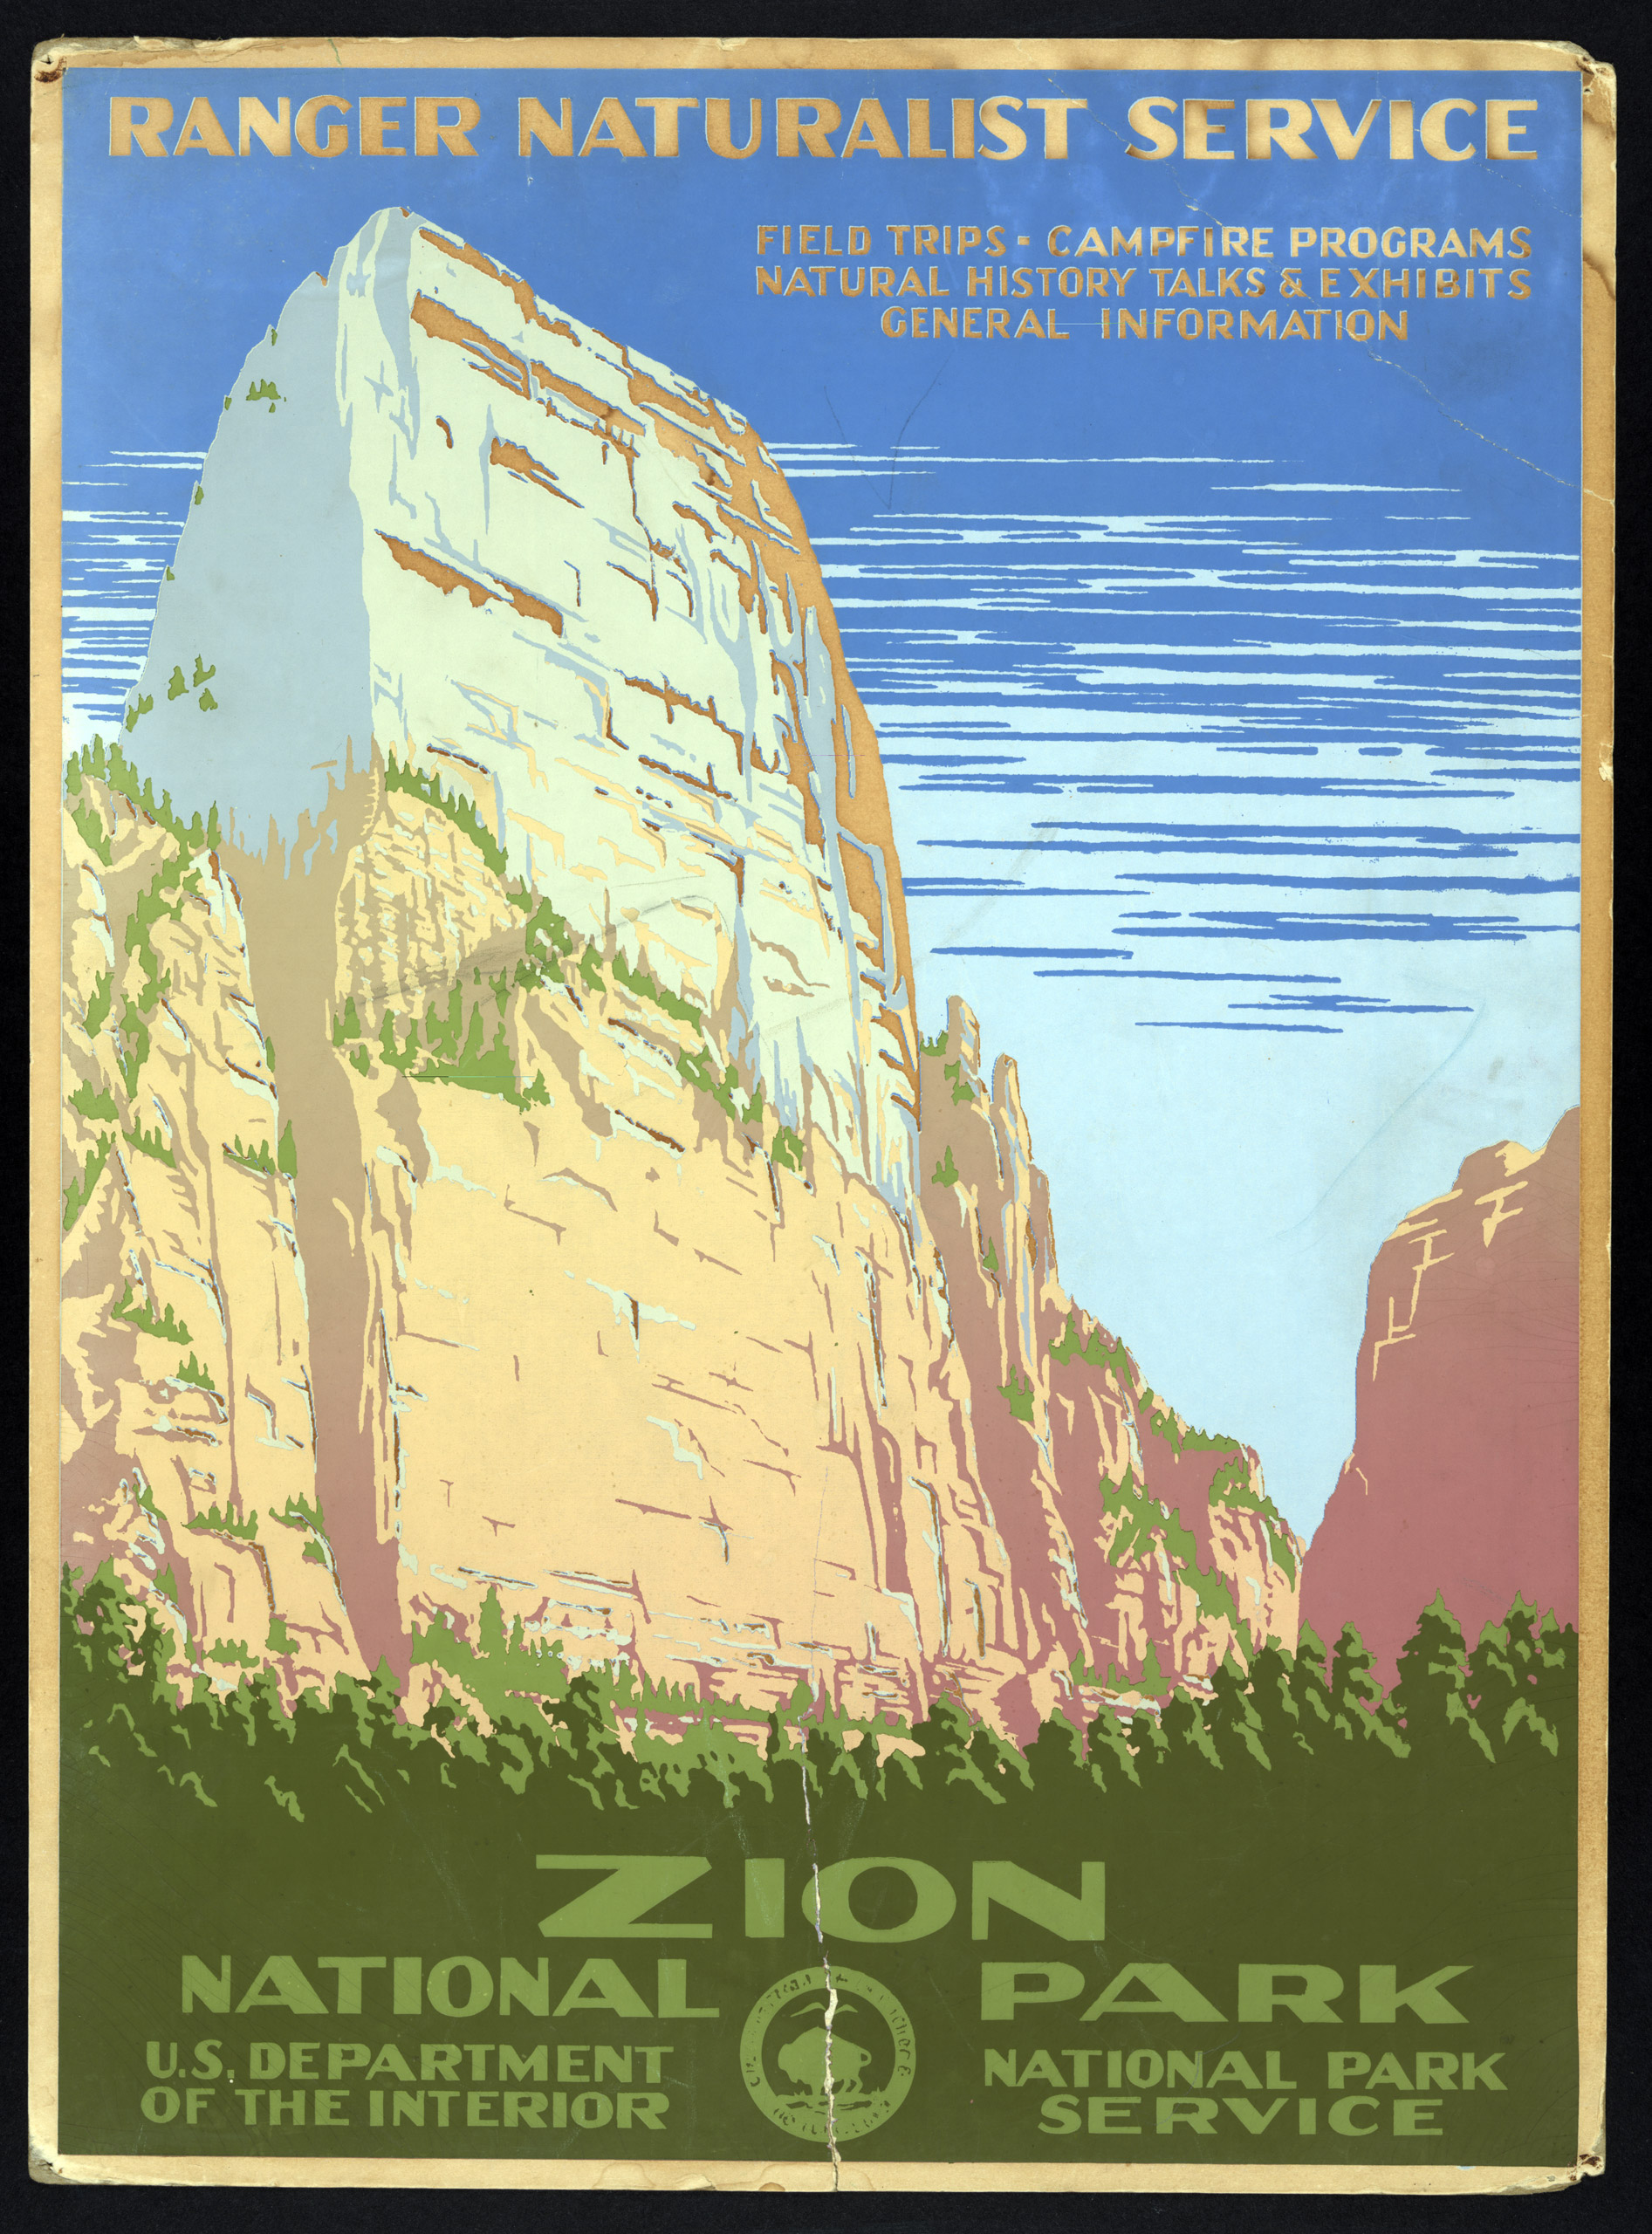 Zion National Park, Ranger Naturalist Service, ca. 1938.